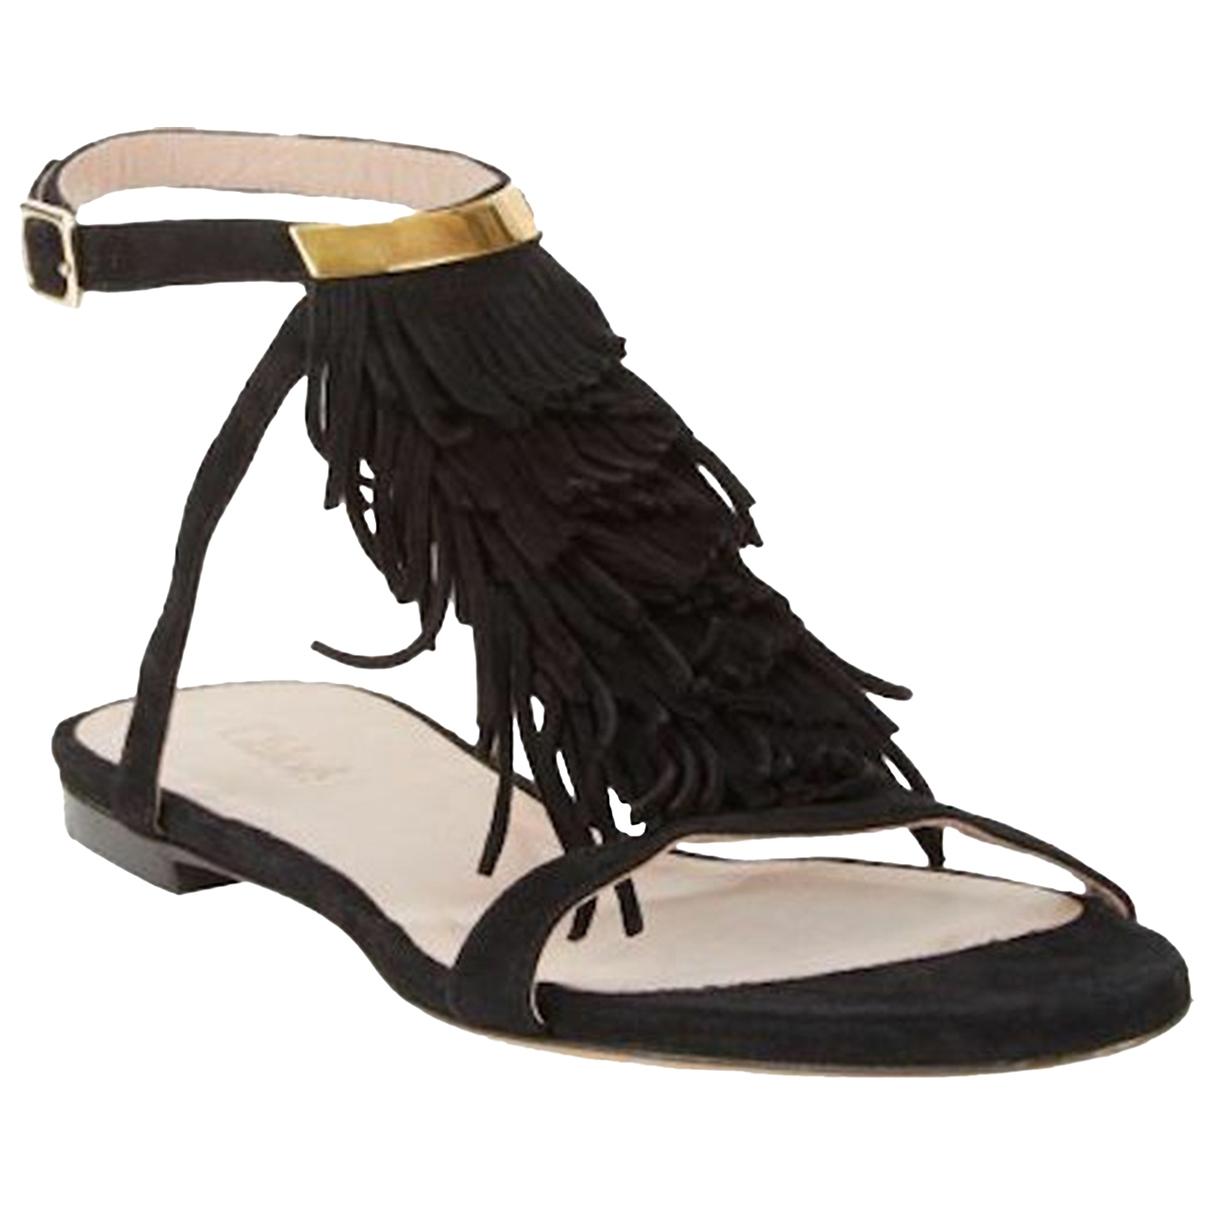 Chloé \N Black Suede Sandals for Women 38 EU